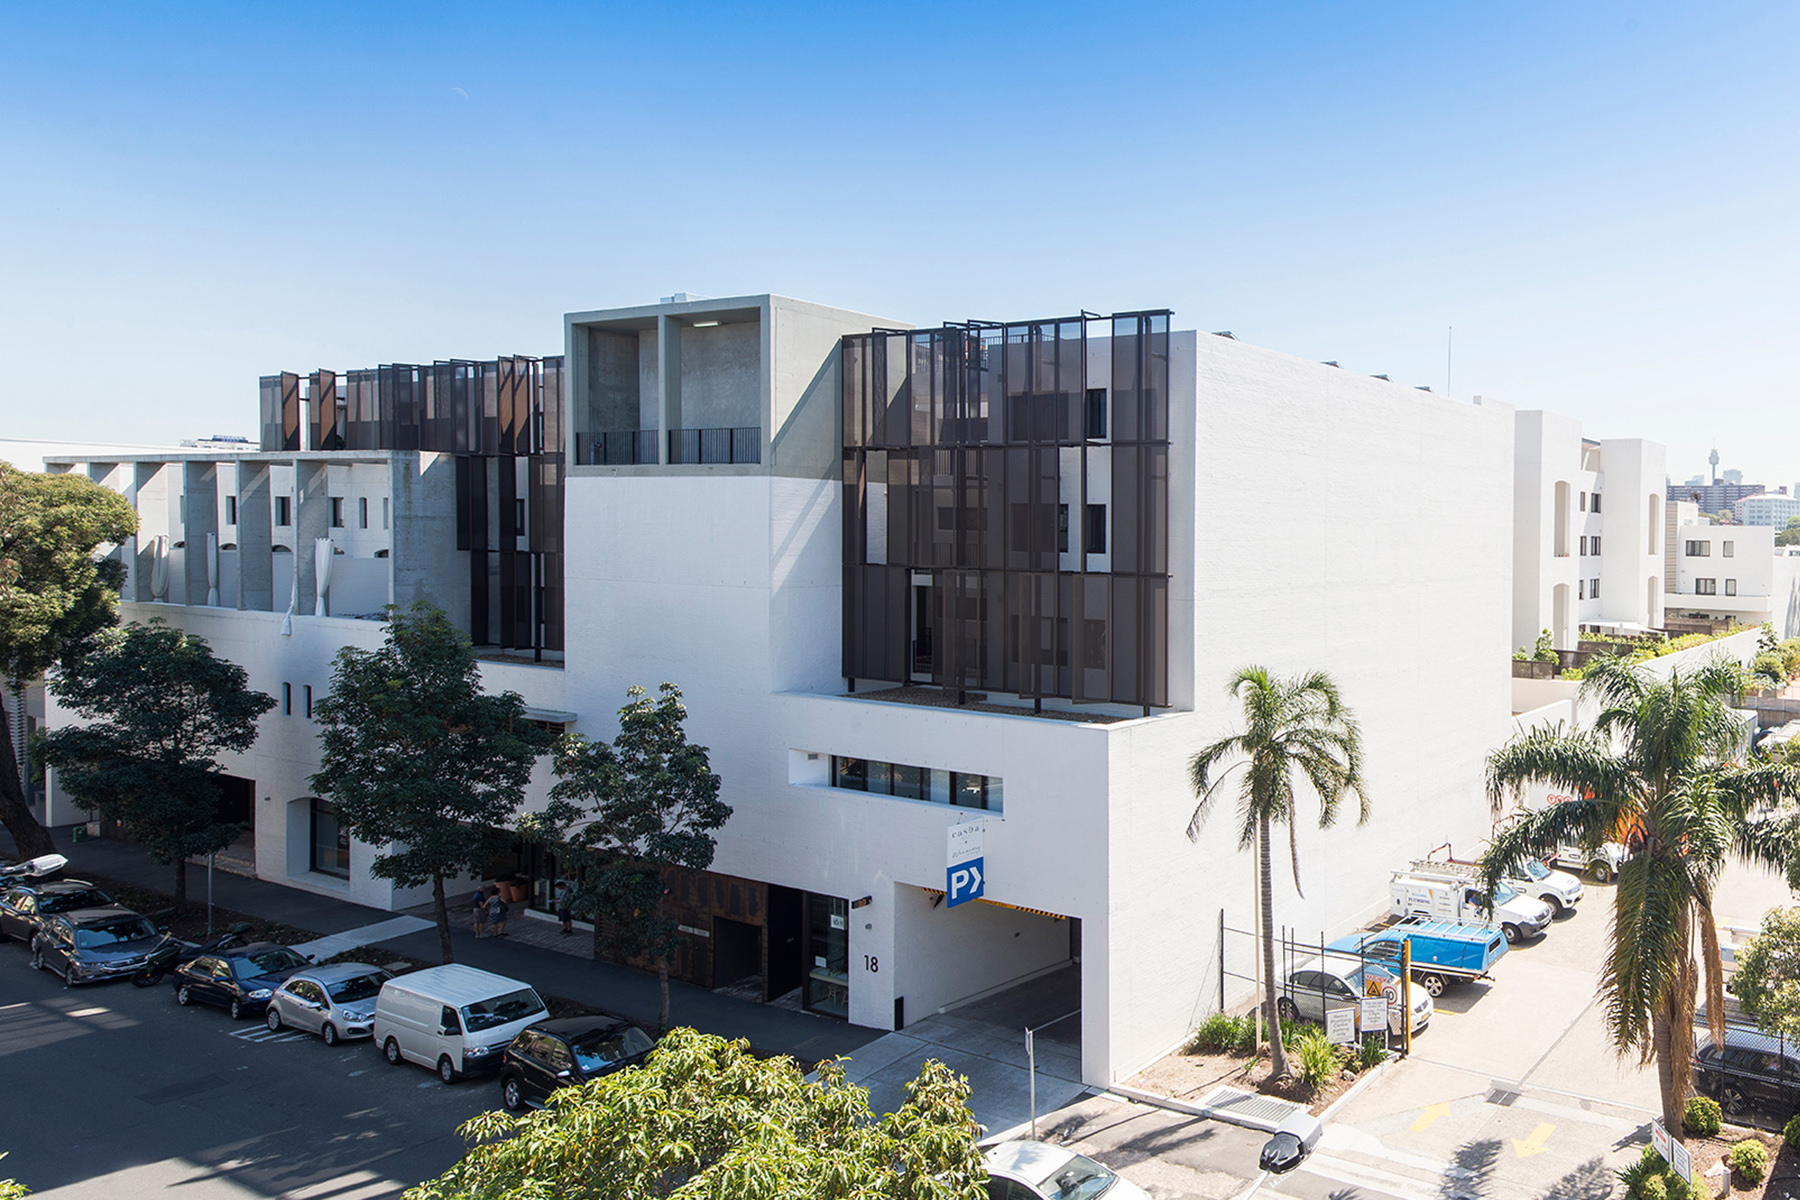 Architecture, Casba, BLP